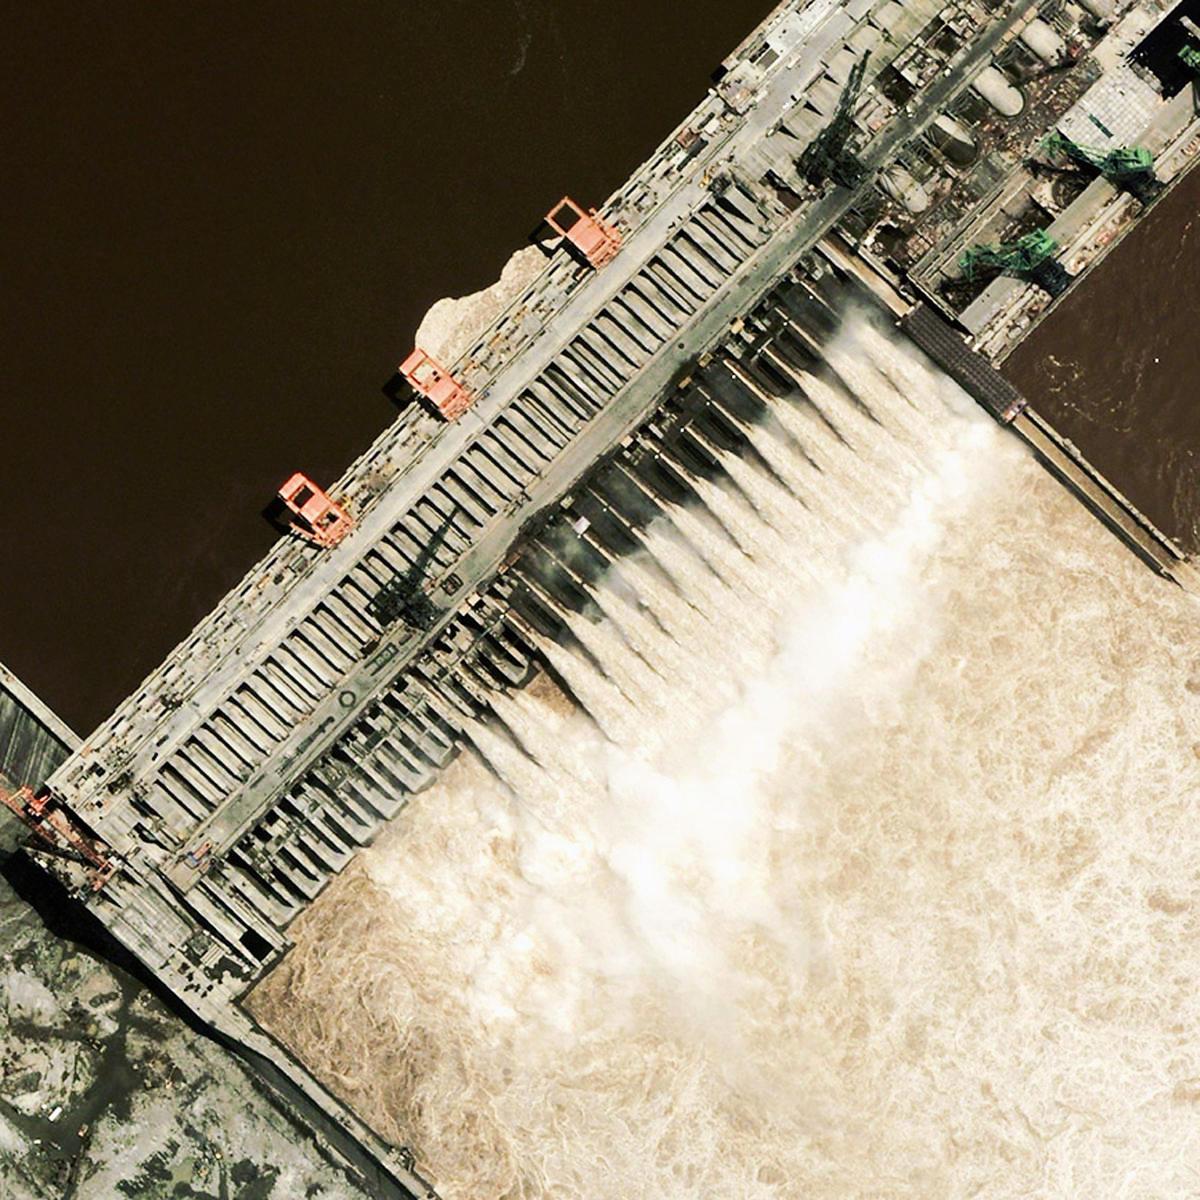 長江三峽大壩衛星圖像。(Getty Images)